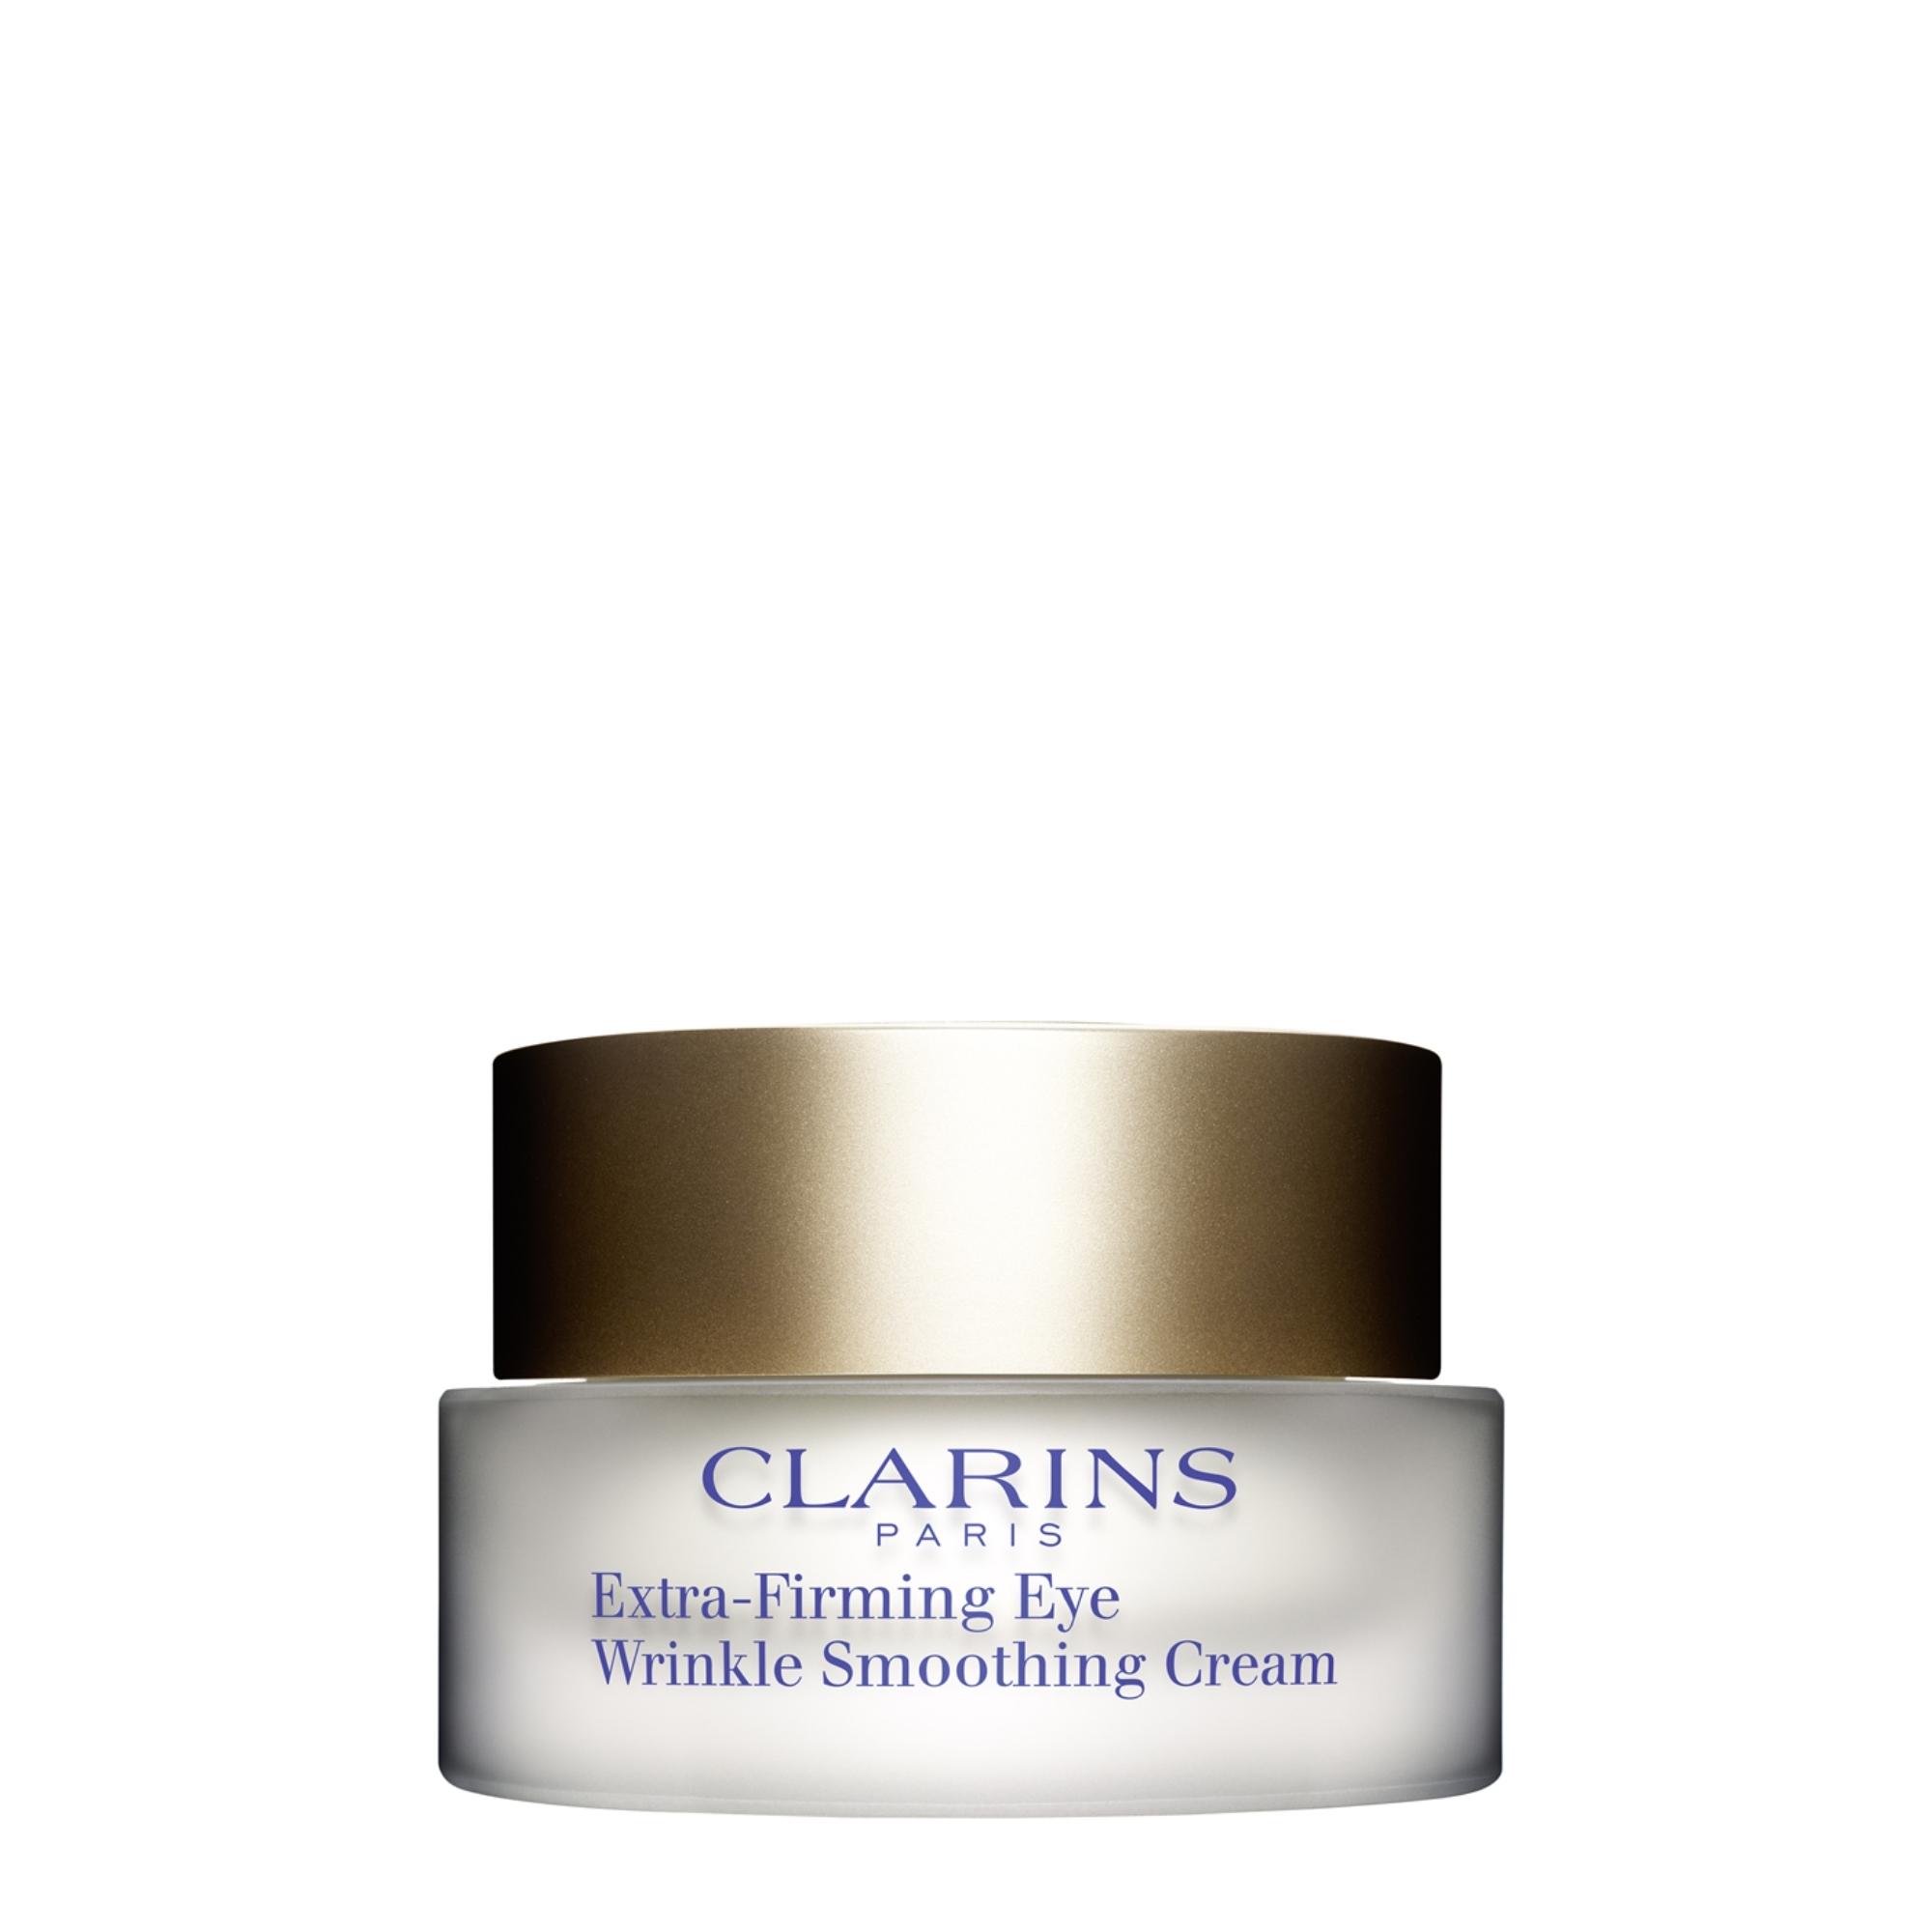 Extra-Firming Eye Wrinkle Smoothing Cream